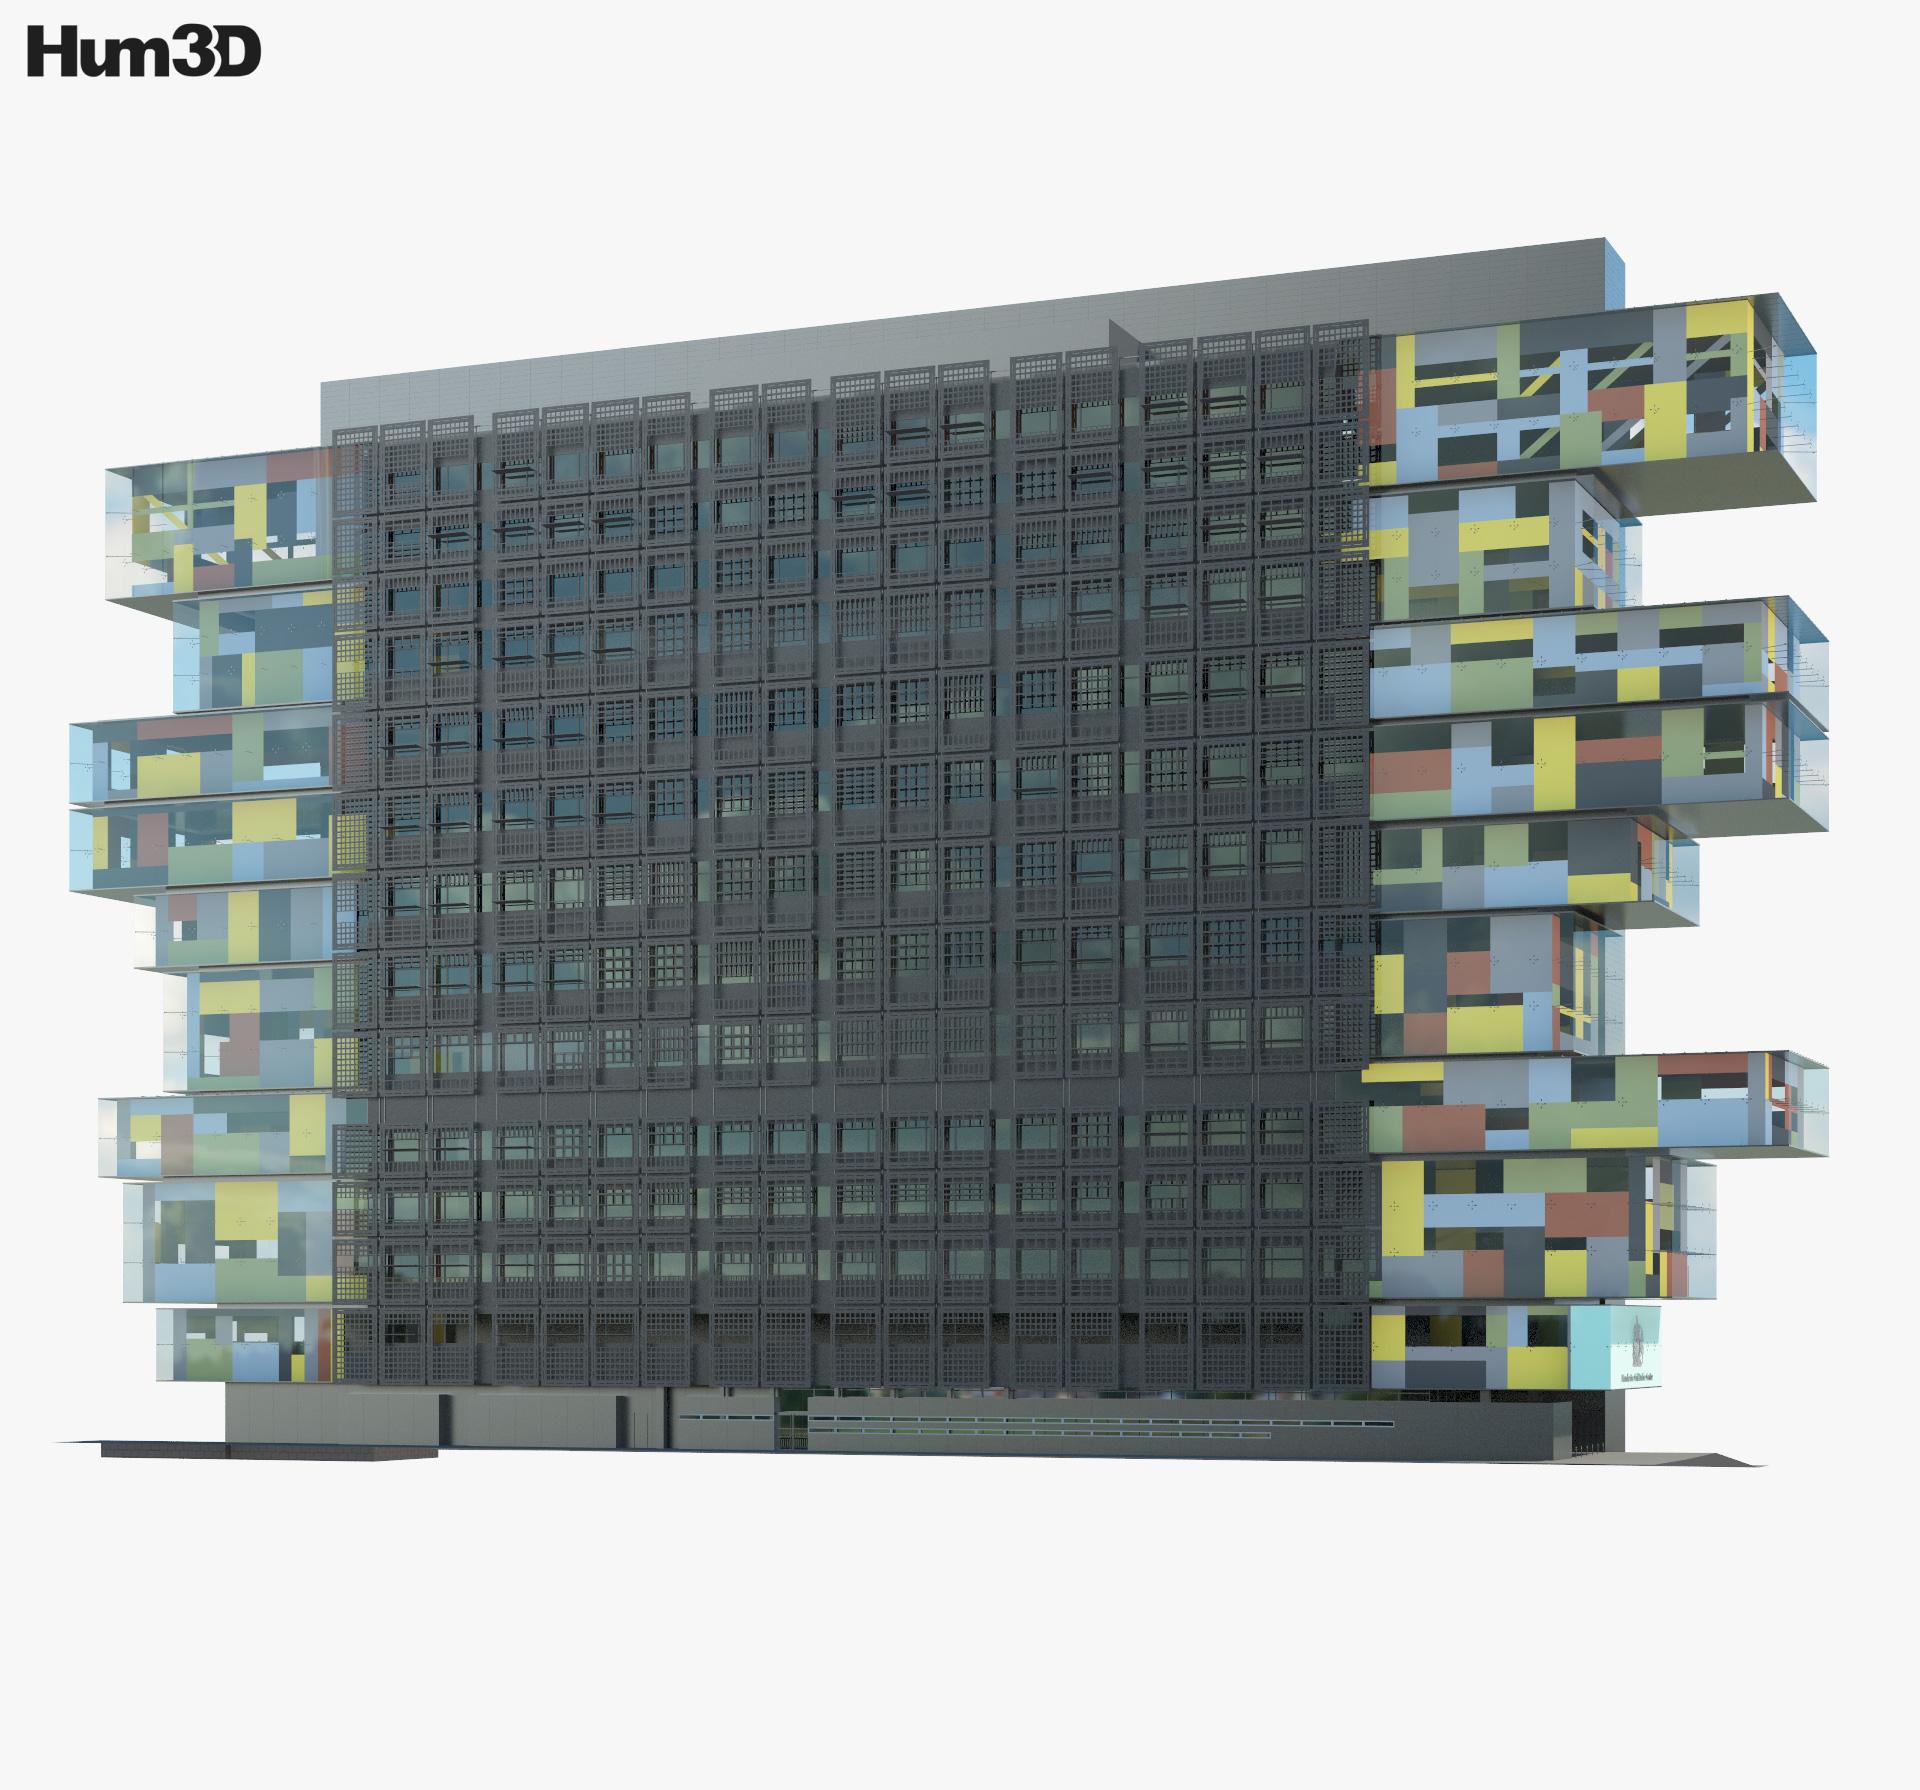 Manchester Civil Justice Centre 3d model